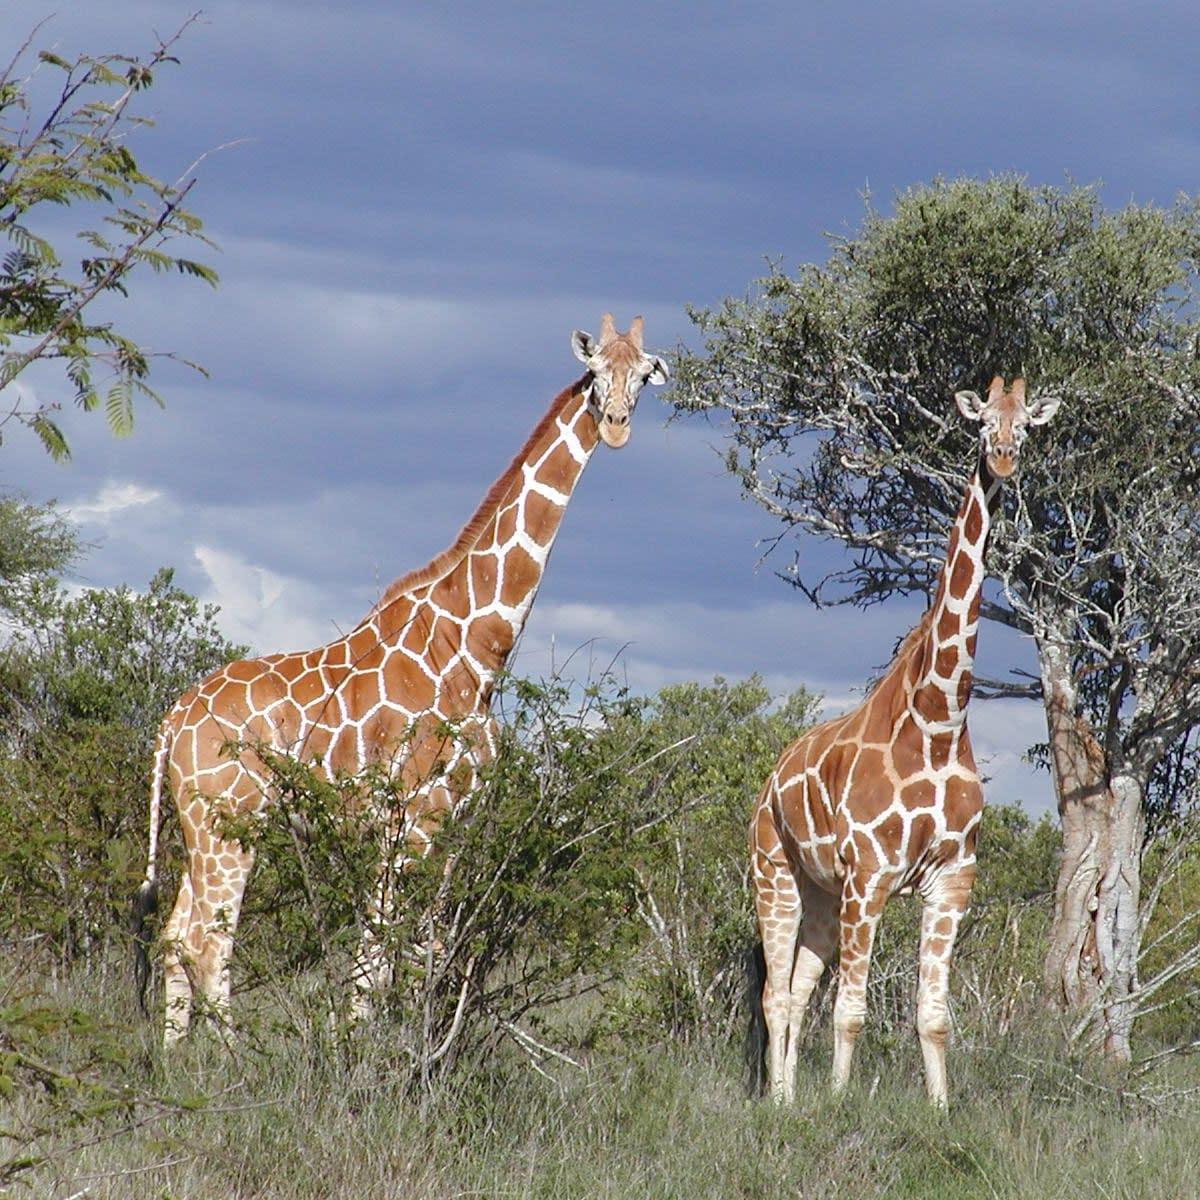 2 giraffes standing in the bush